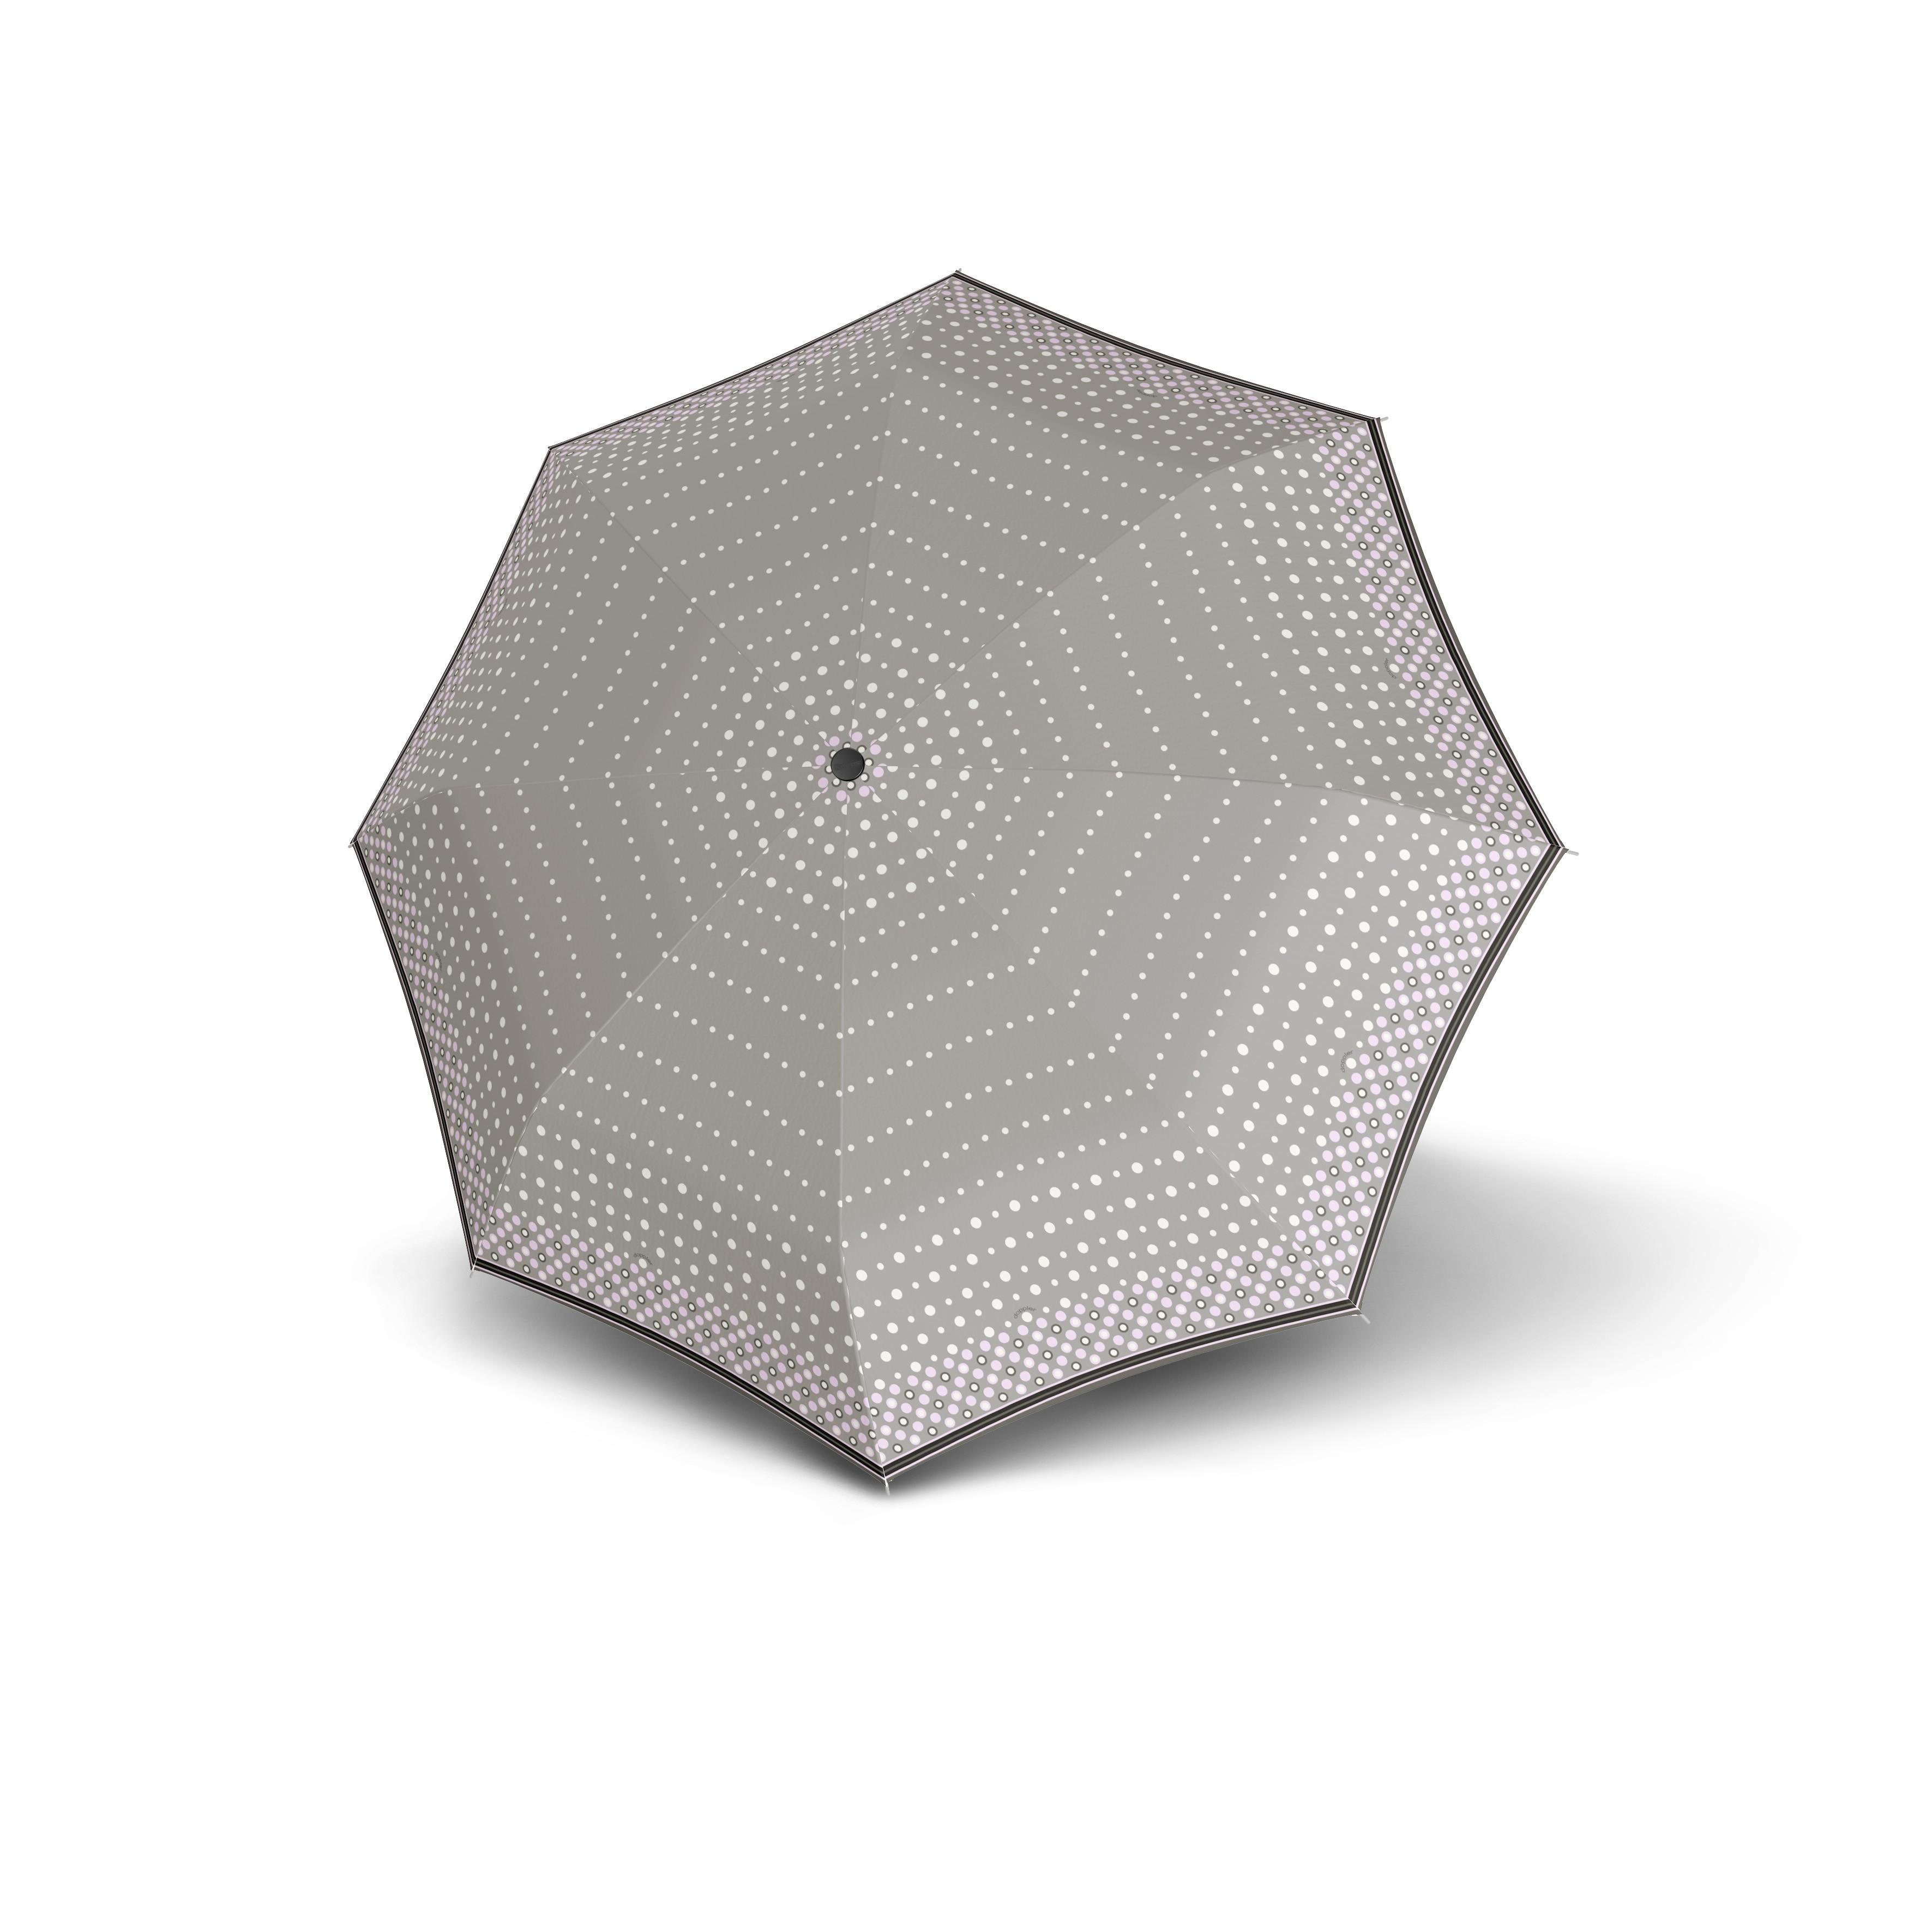 Šedý puntikovaný automatický skládací dámský deštník Abnaki